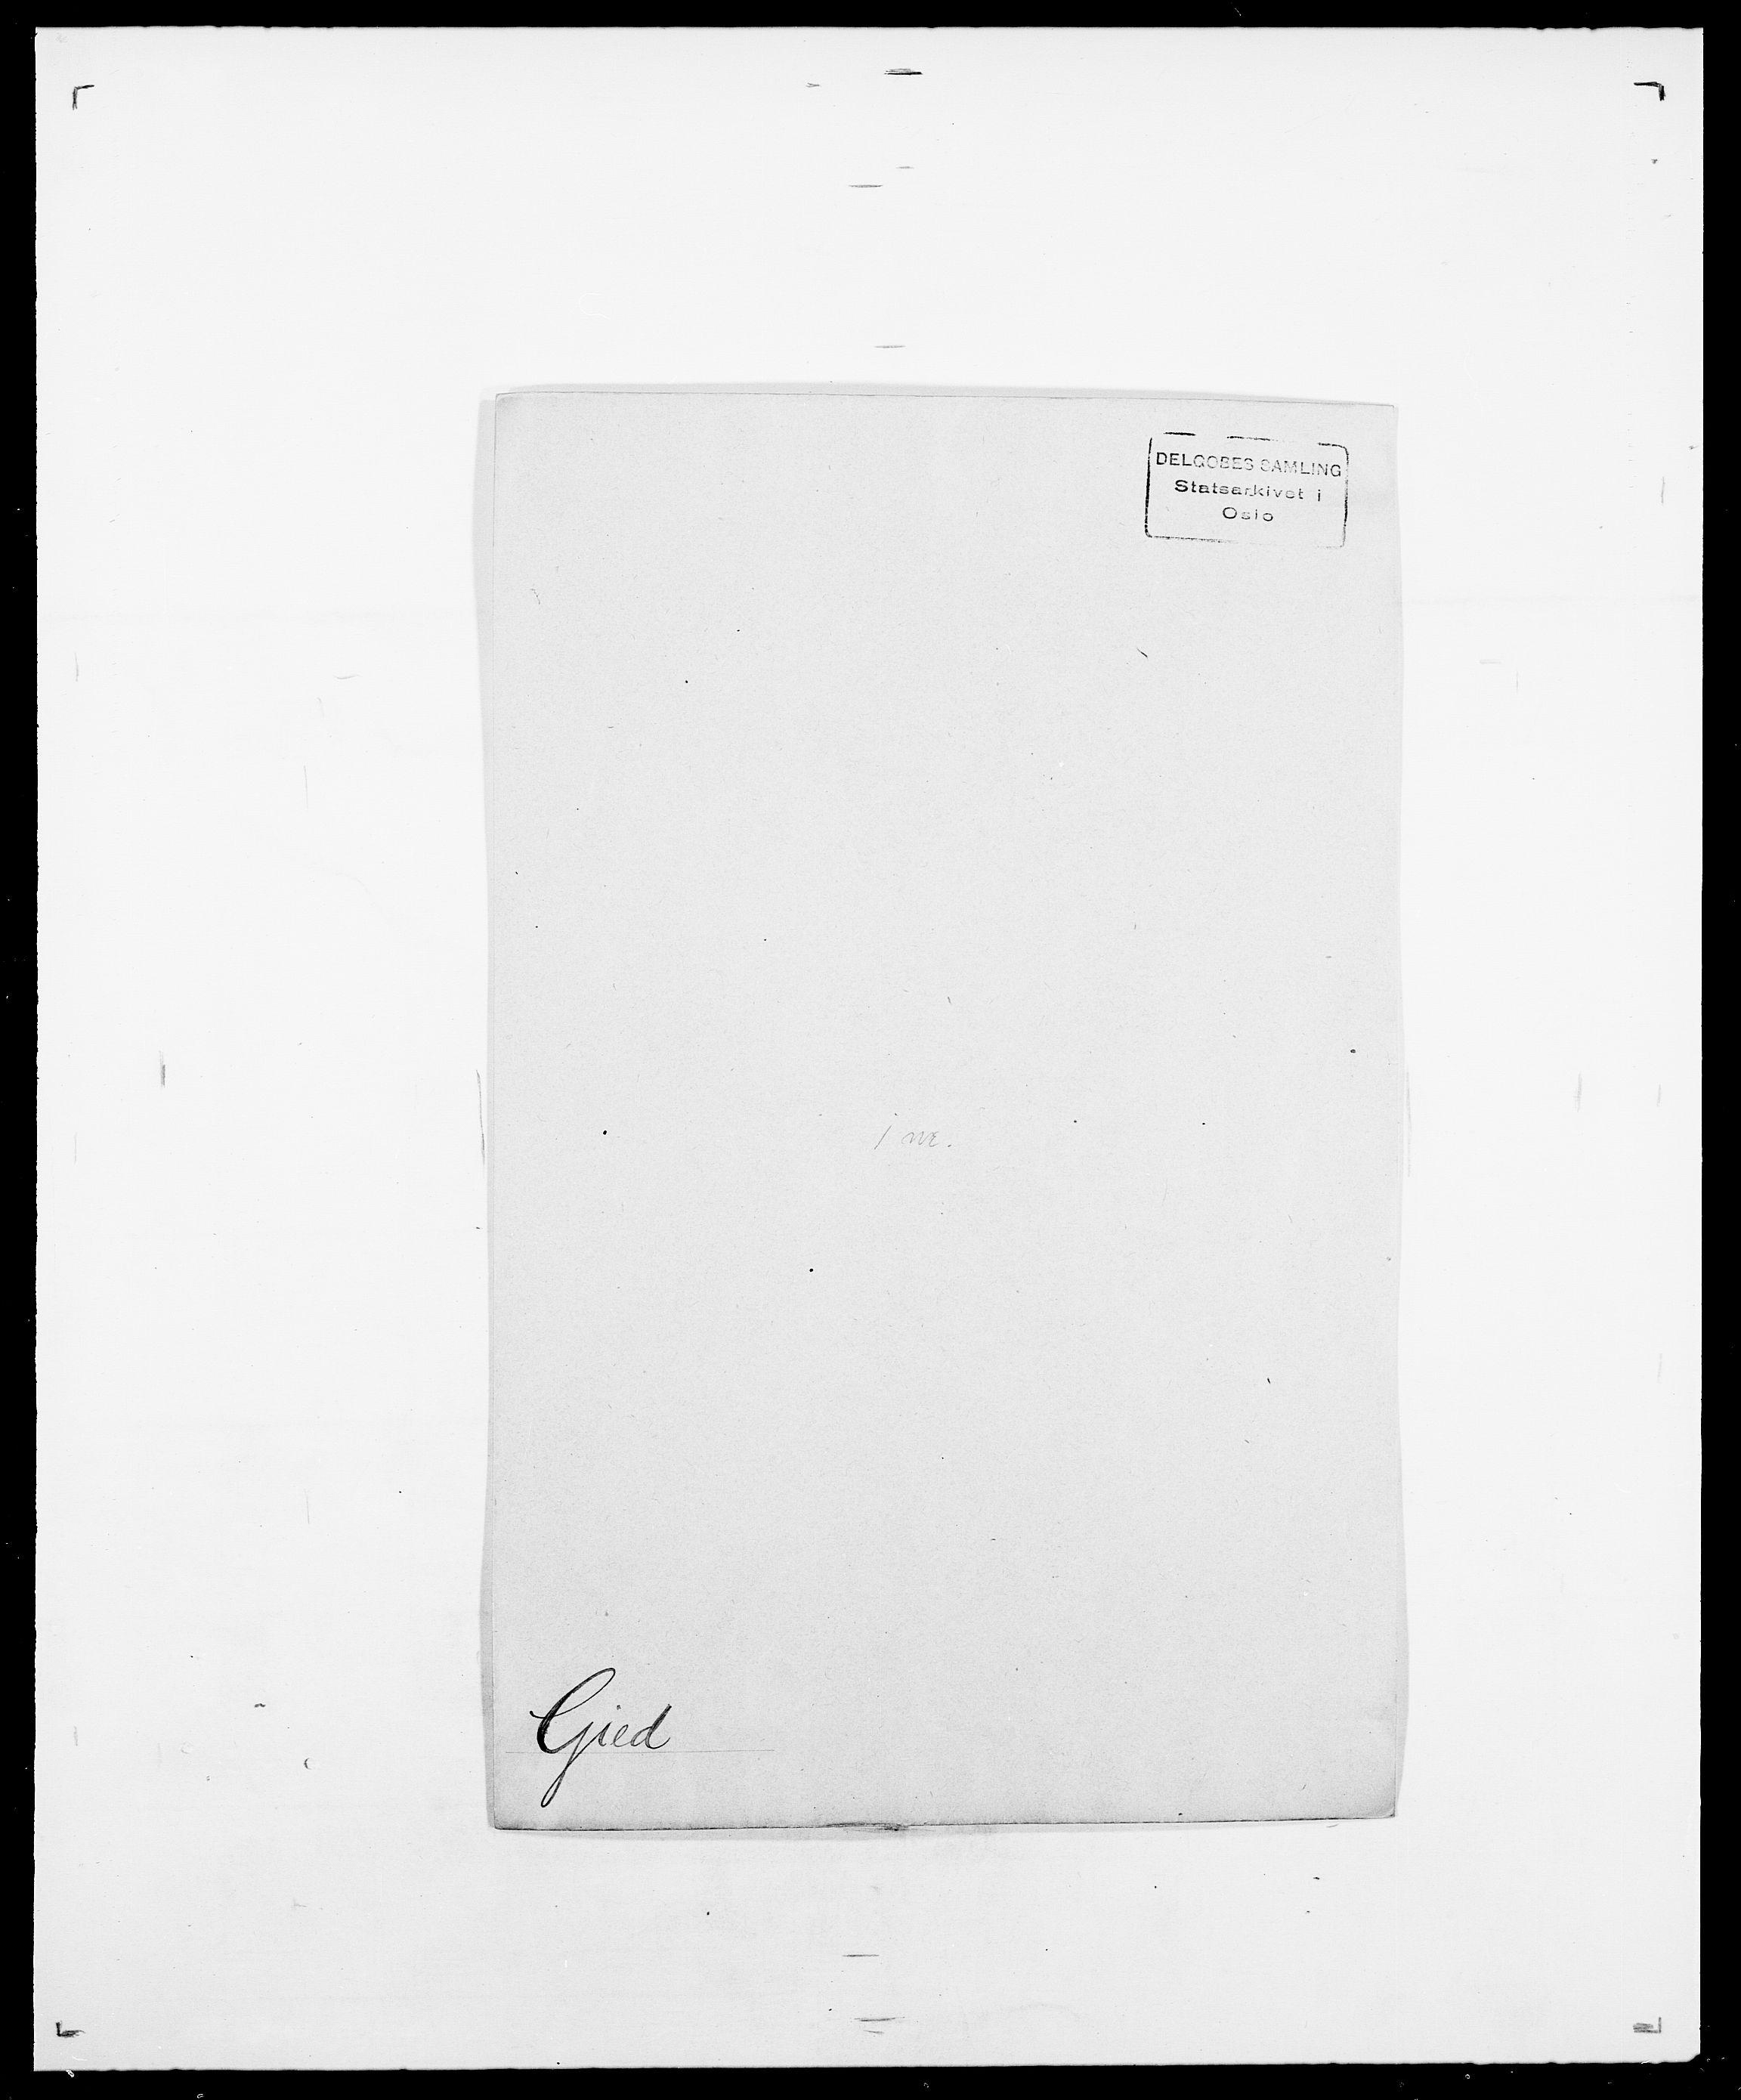 SAO, Delgobe, Charles Antoine - samling, D/Da/L0014: Giebdhausen - Grip, s. 3